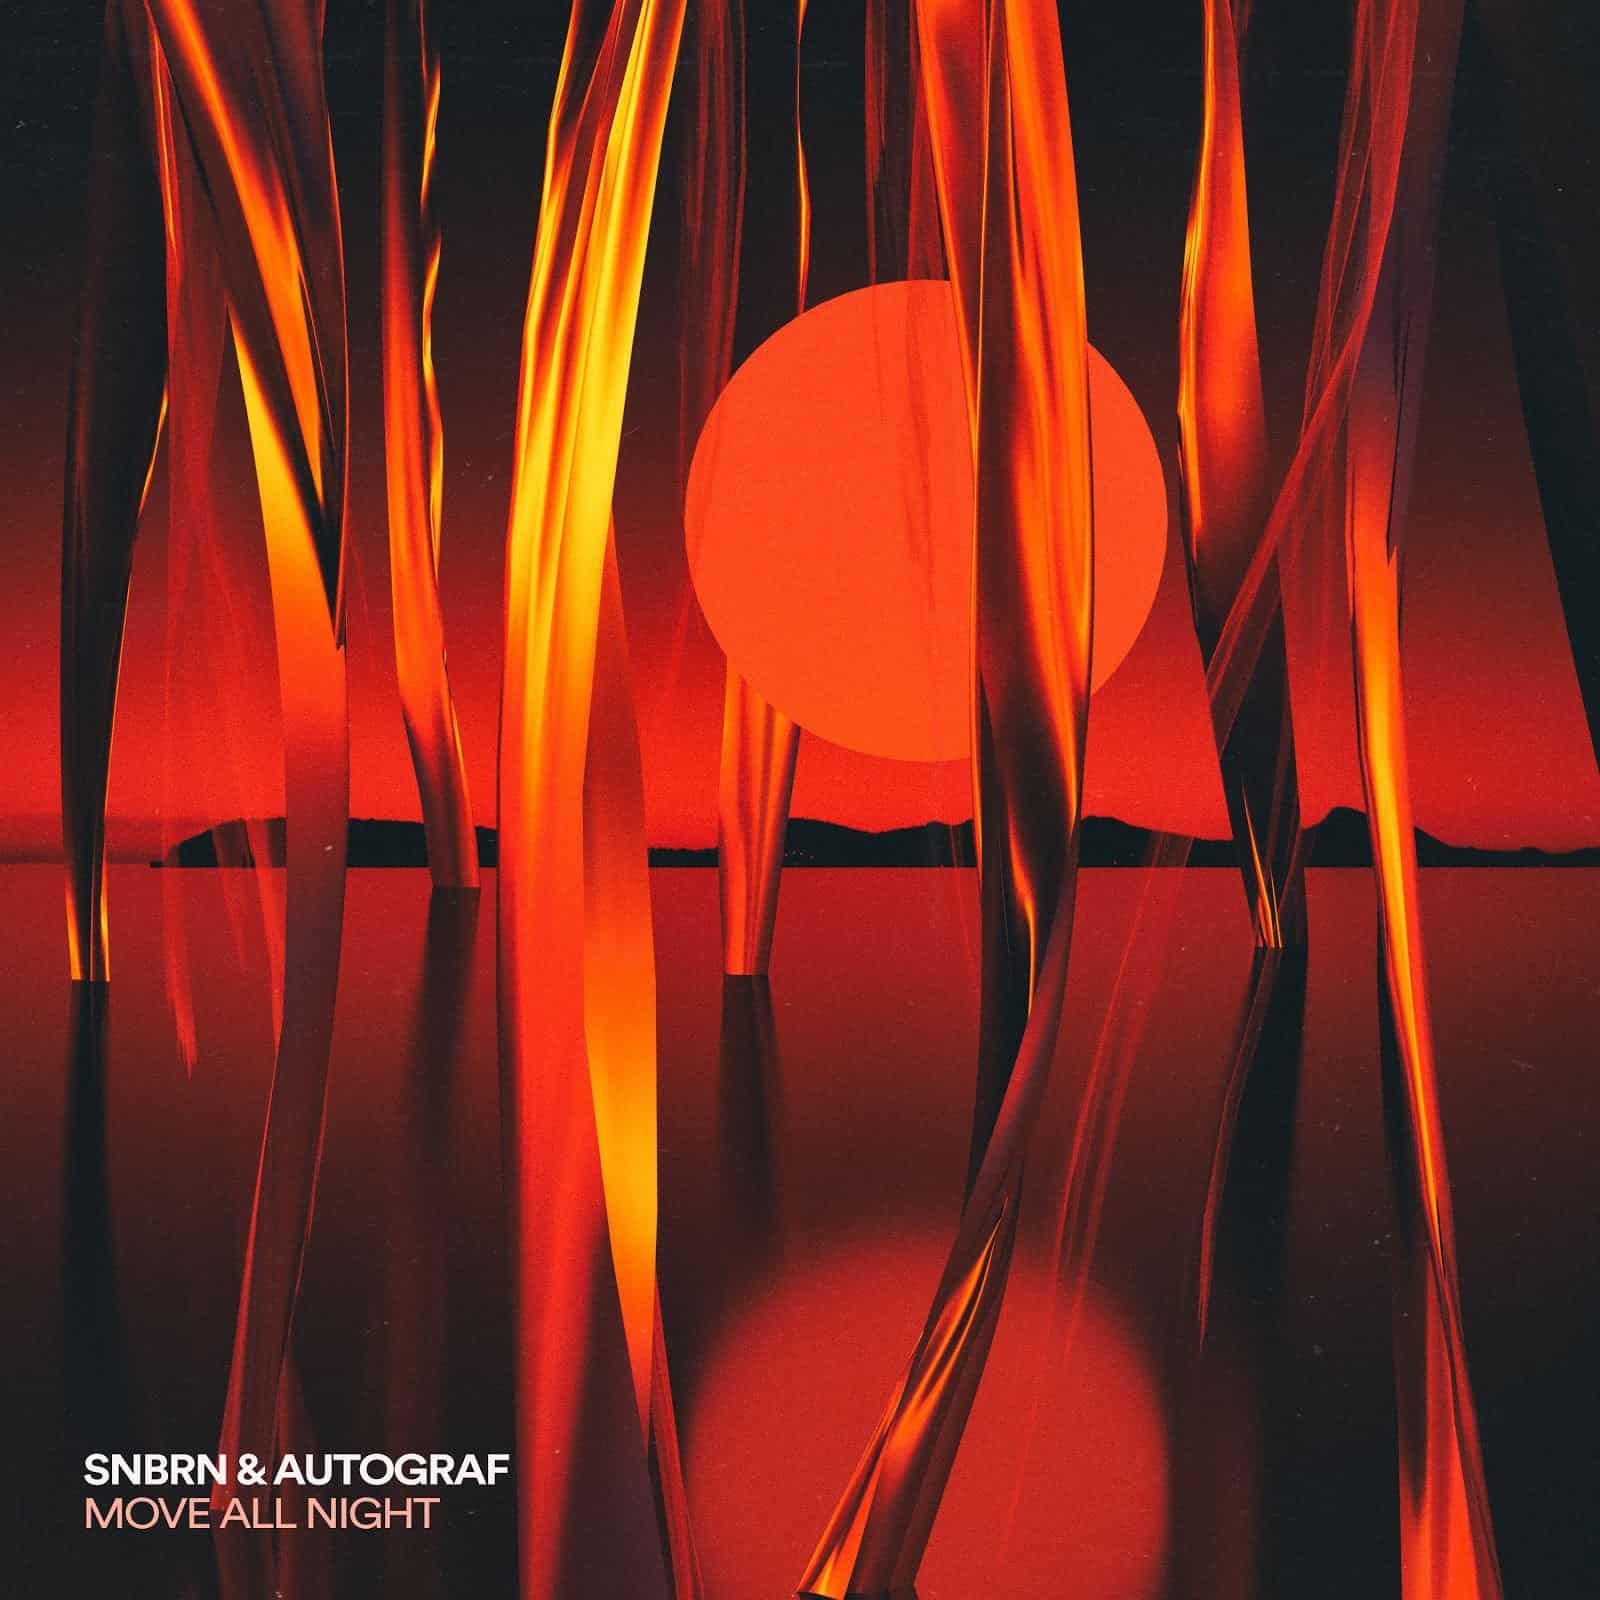 SNBRN & Autograf Team Up On New Ultra Music Single 'Move All Night' ile ilgili görsel sonucu